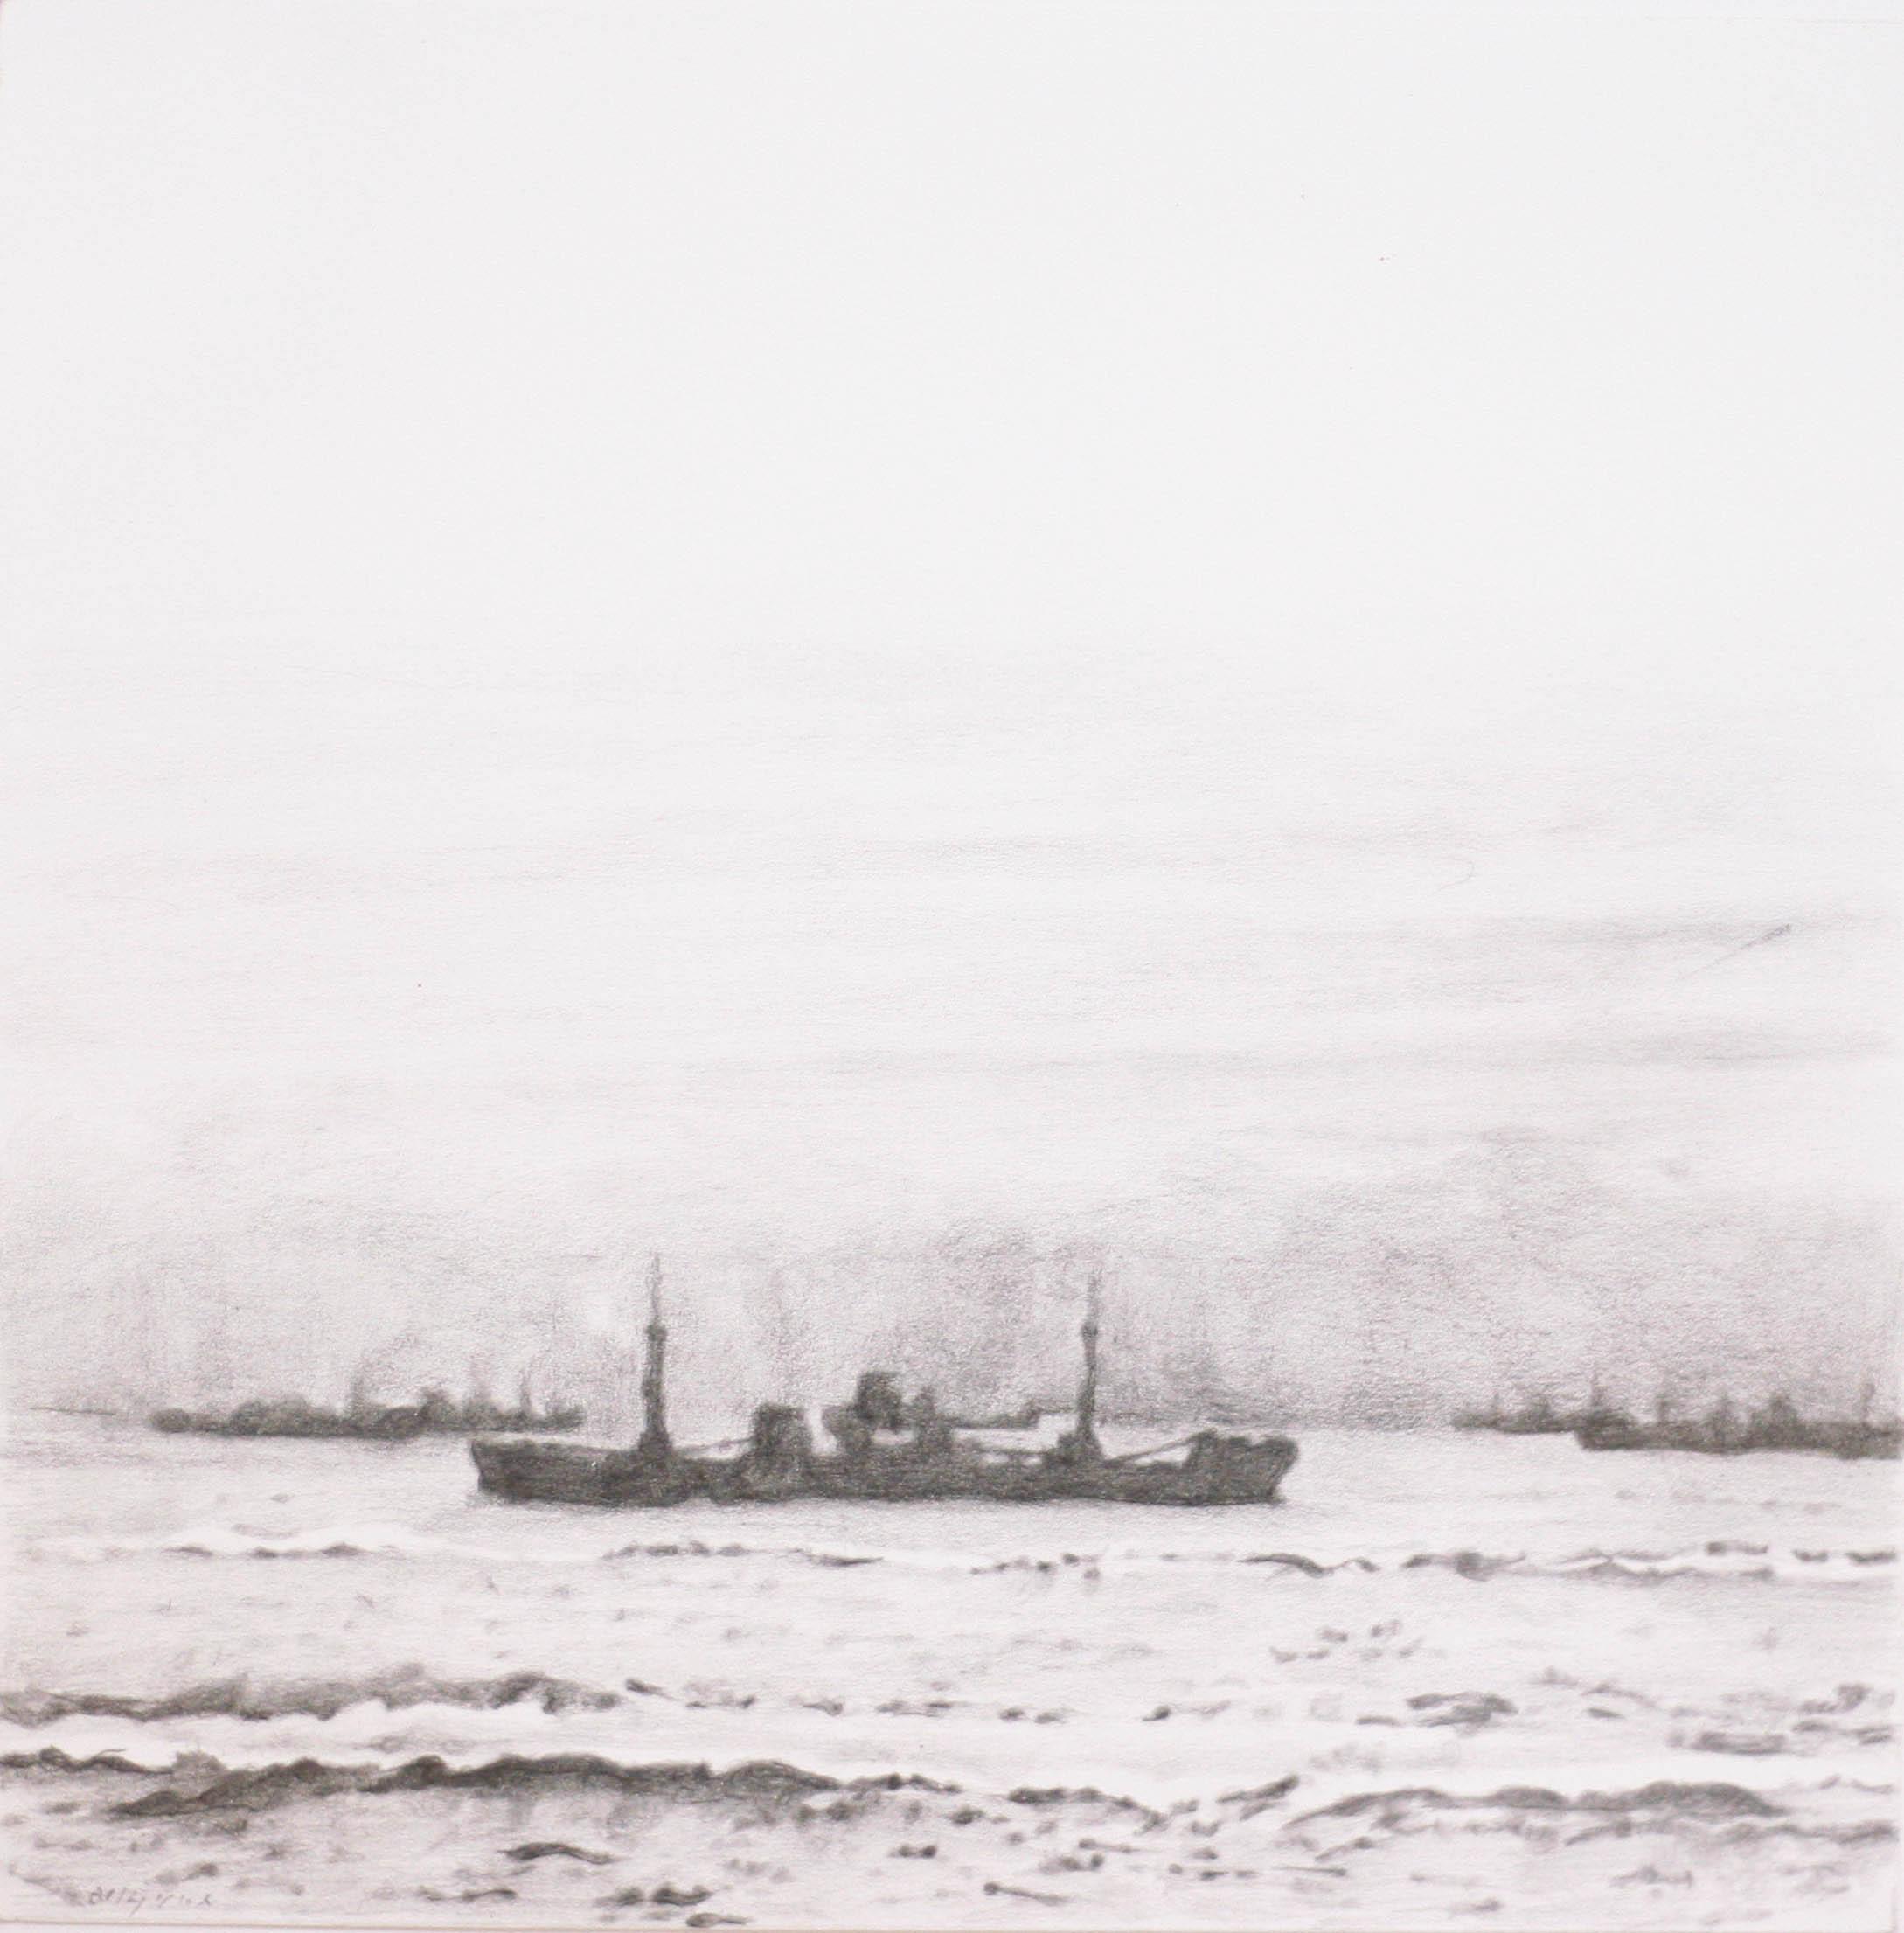 Battleship 11